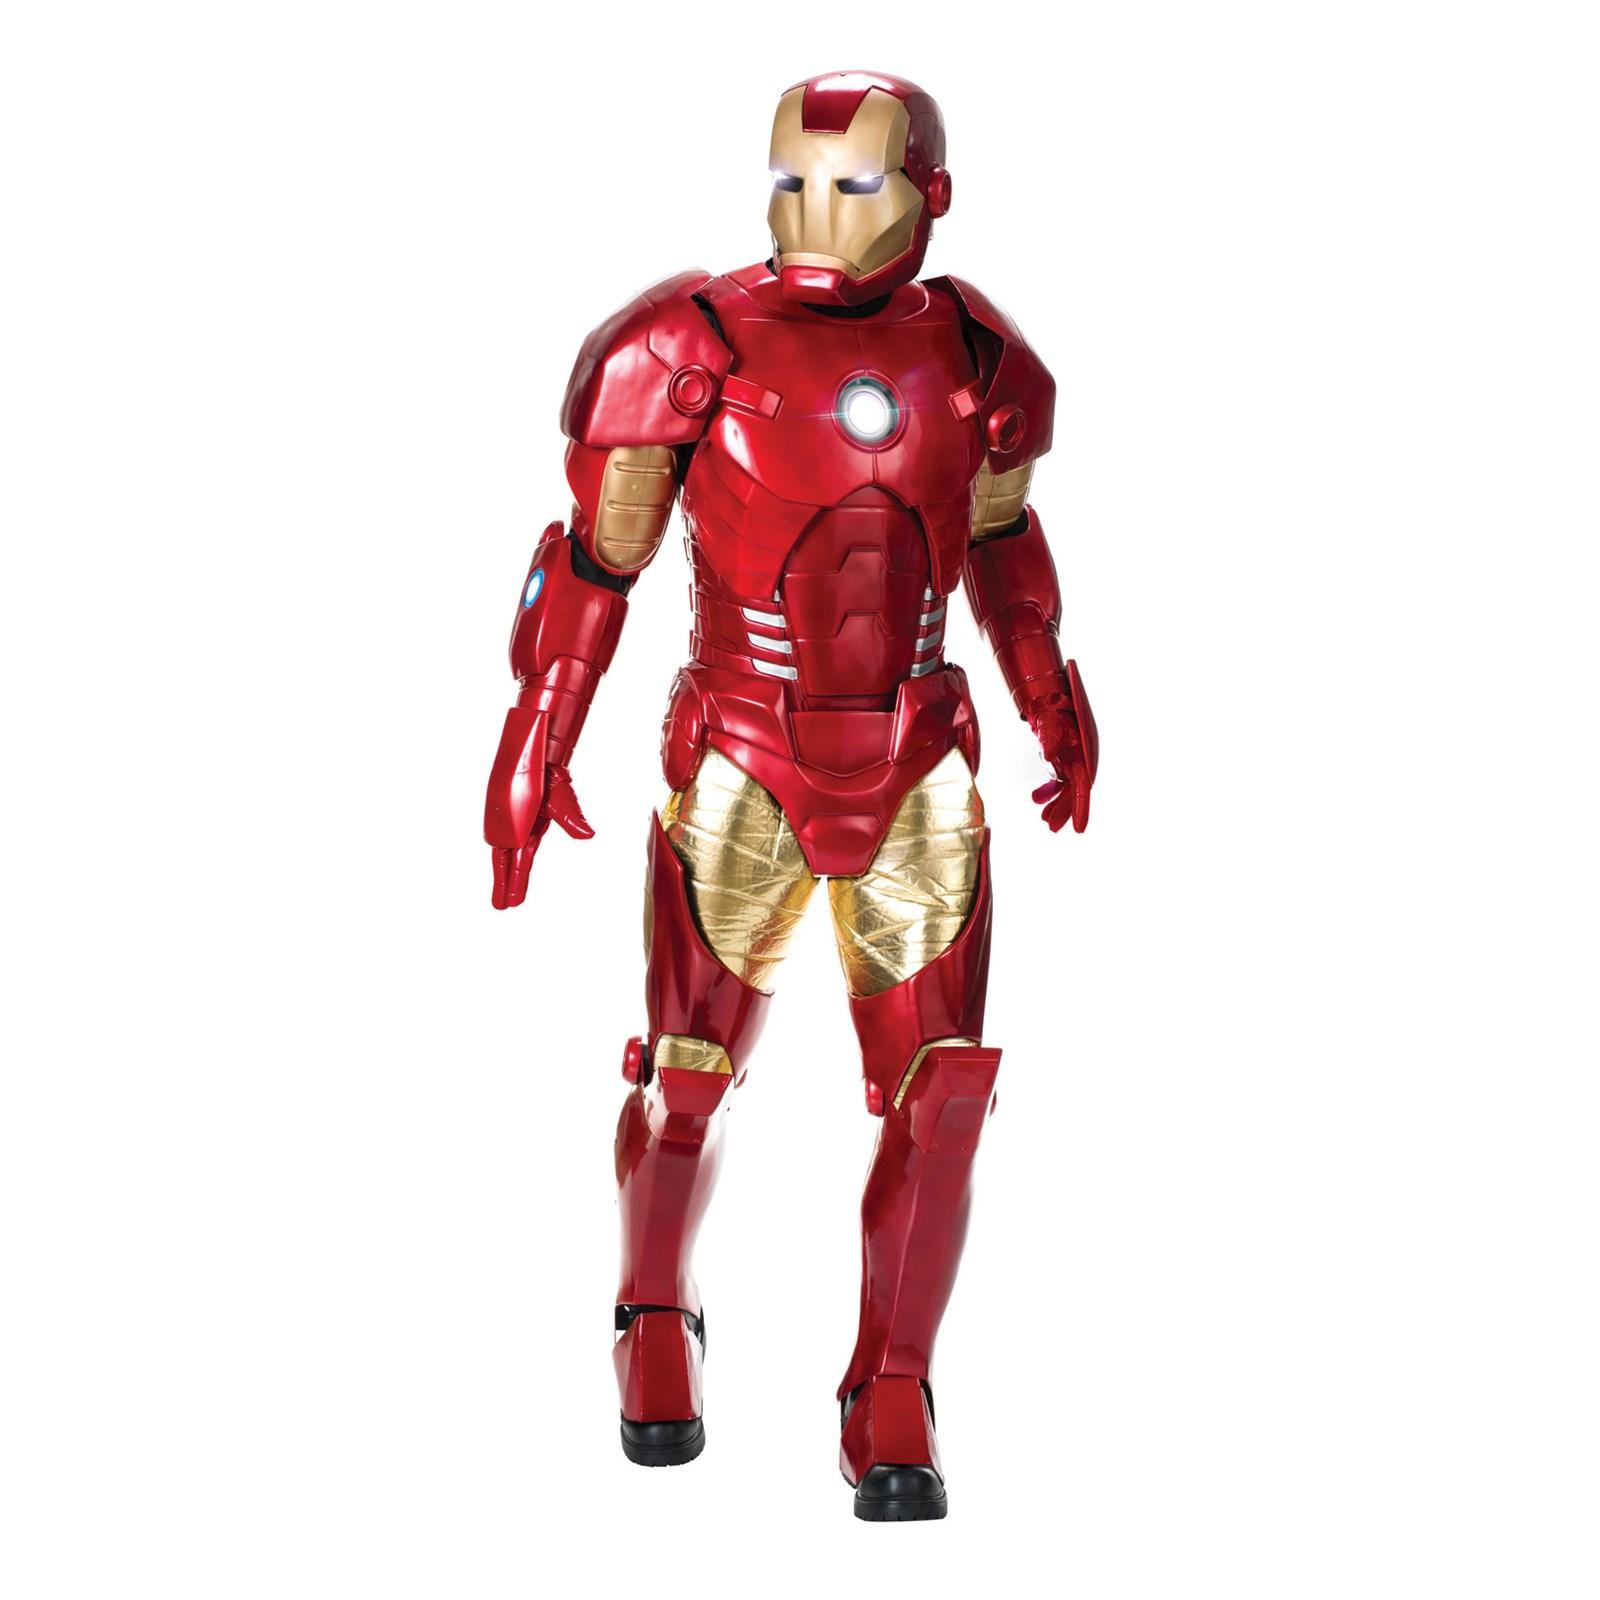 Adult Supreme Edition Iron Man Costume